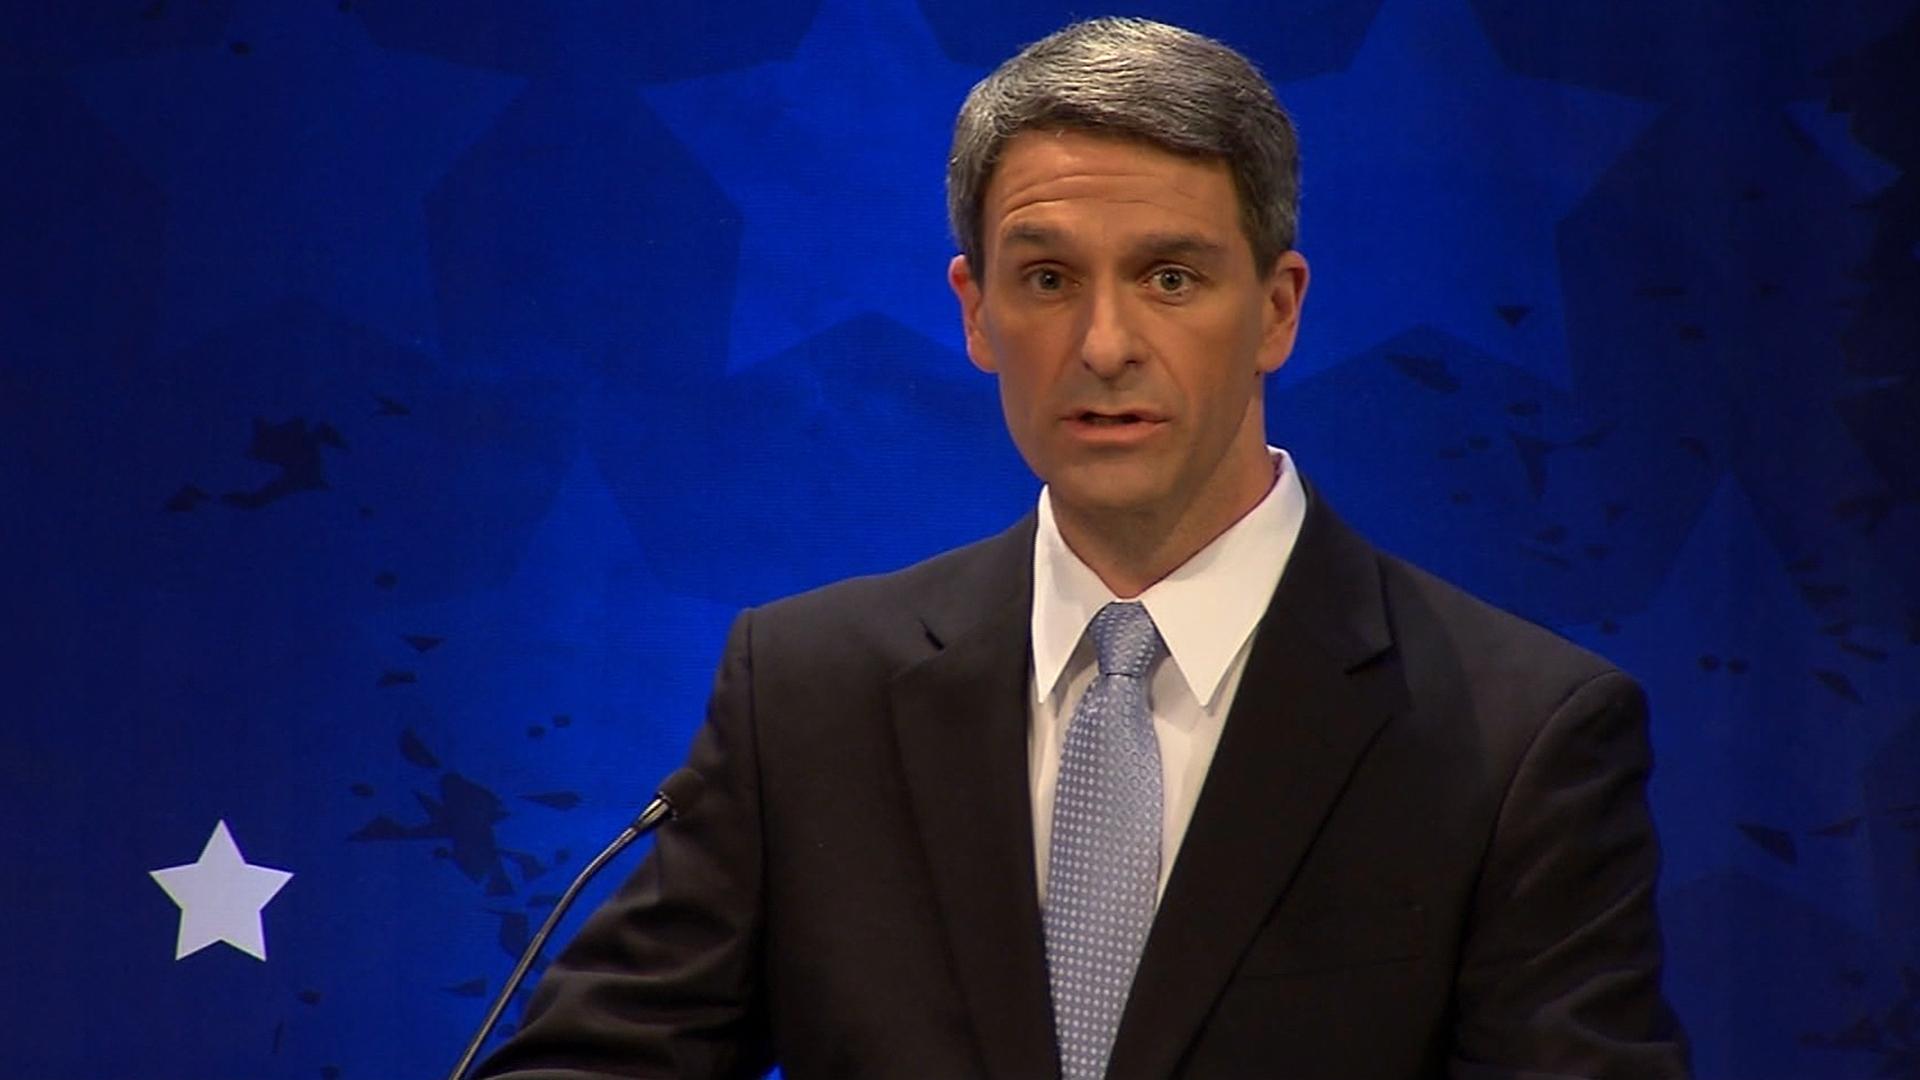 Virginia GOP leaders suffer ignominious turn